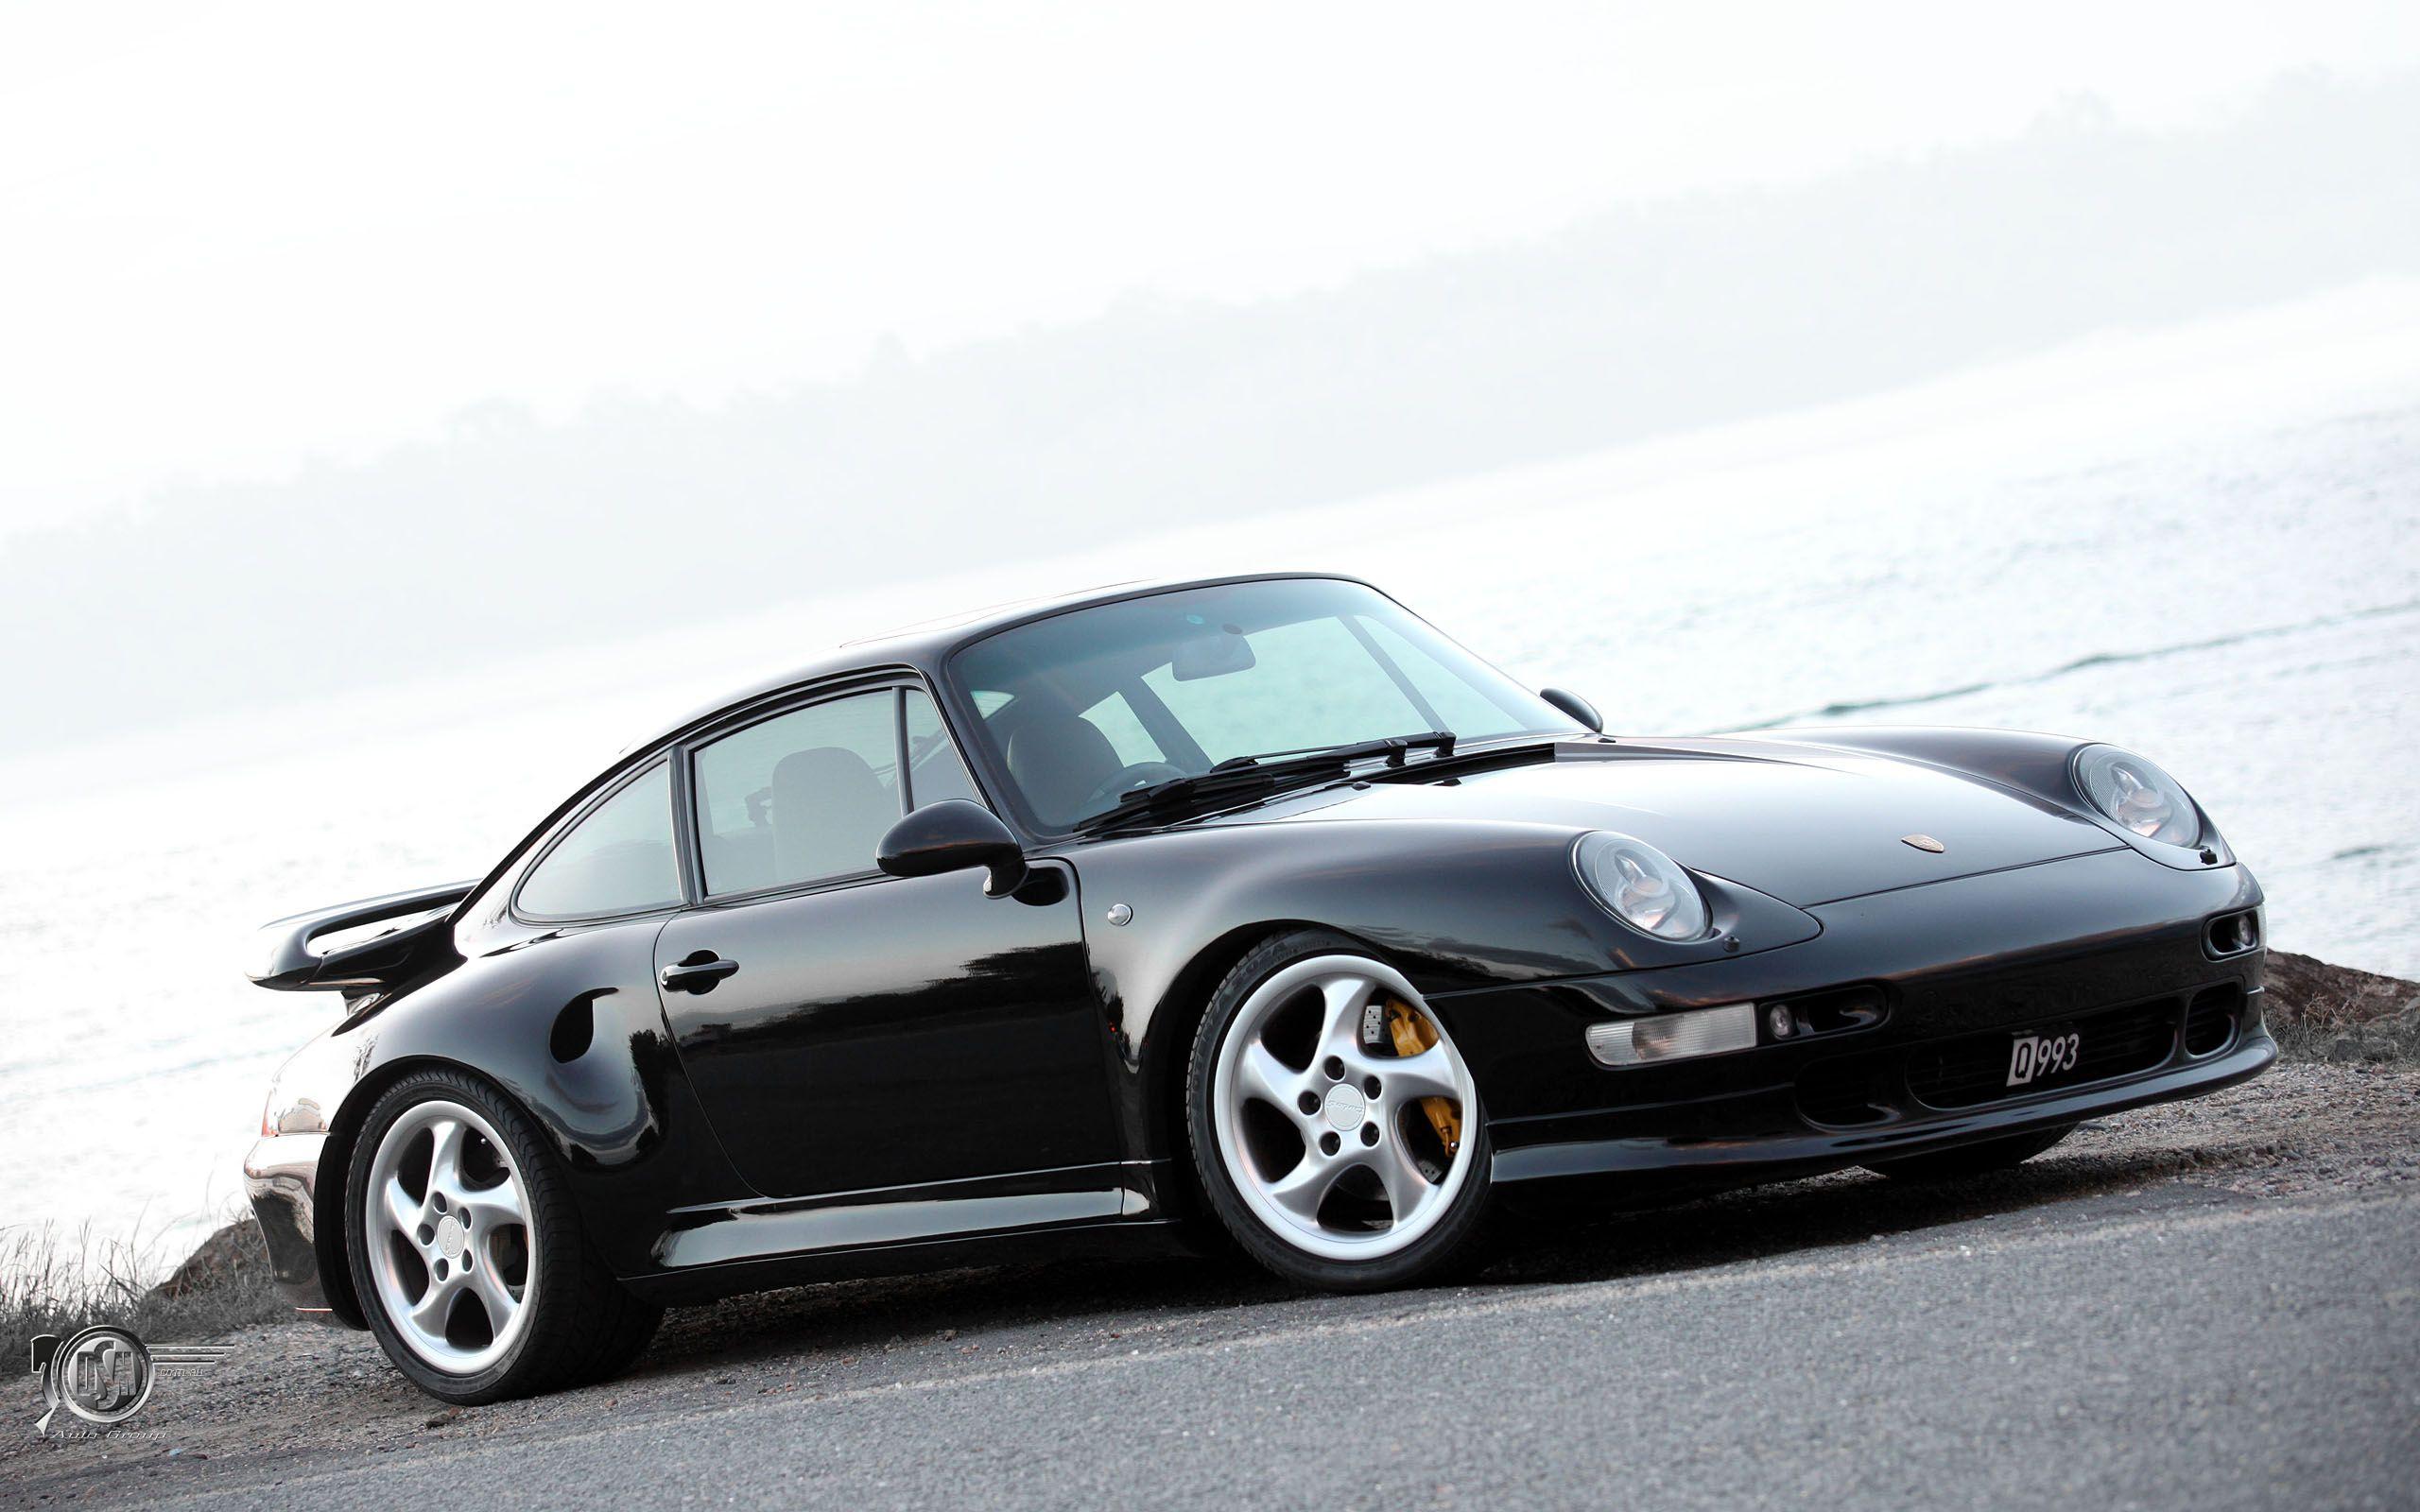 Porsche 993 Turbo Coast - Kaliteli Wallpaper Download # ...